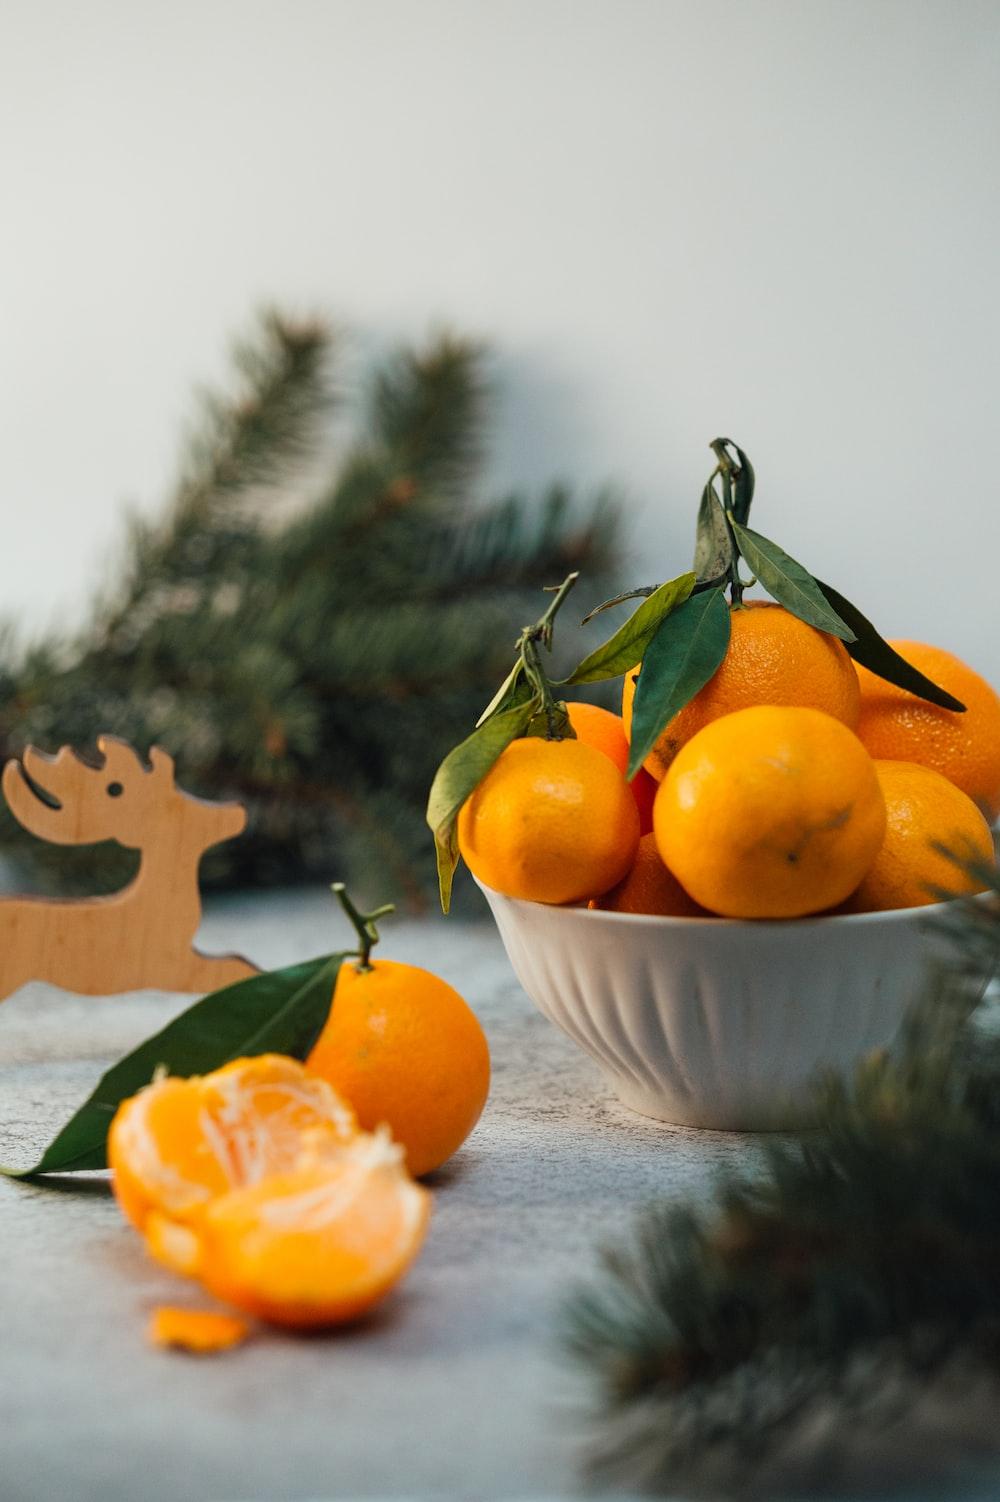 orange fruits on white ceramic bowl